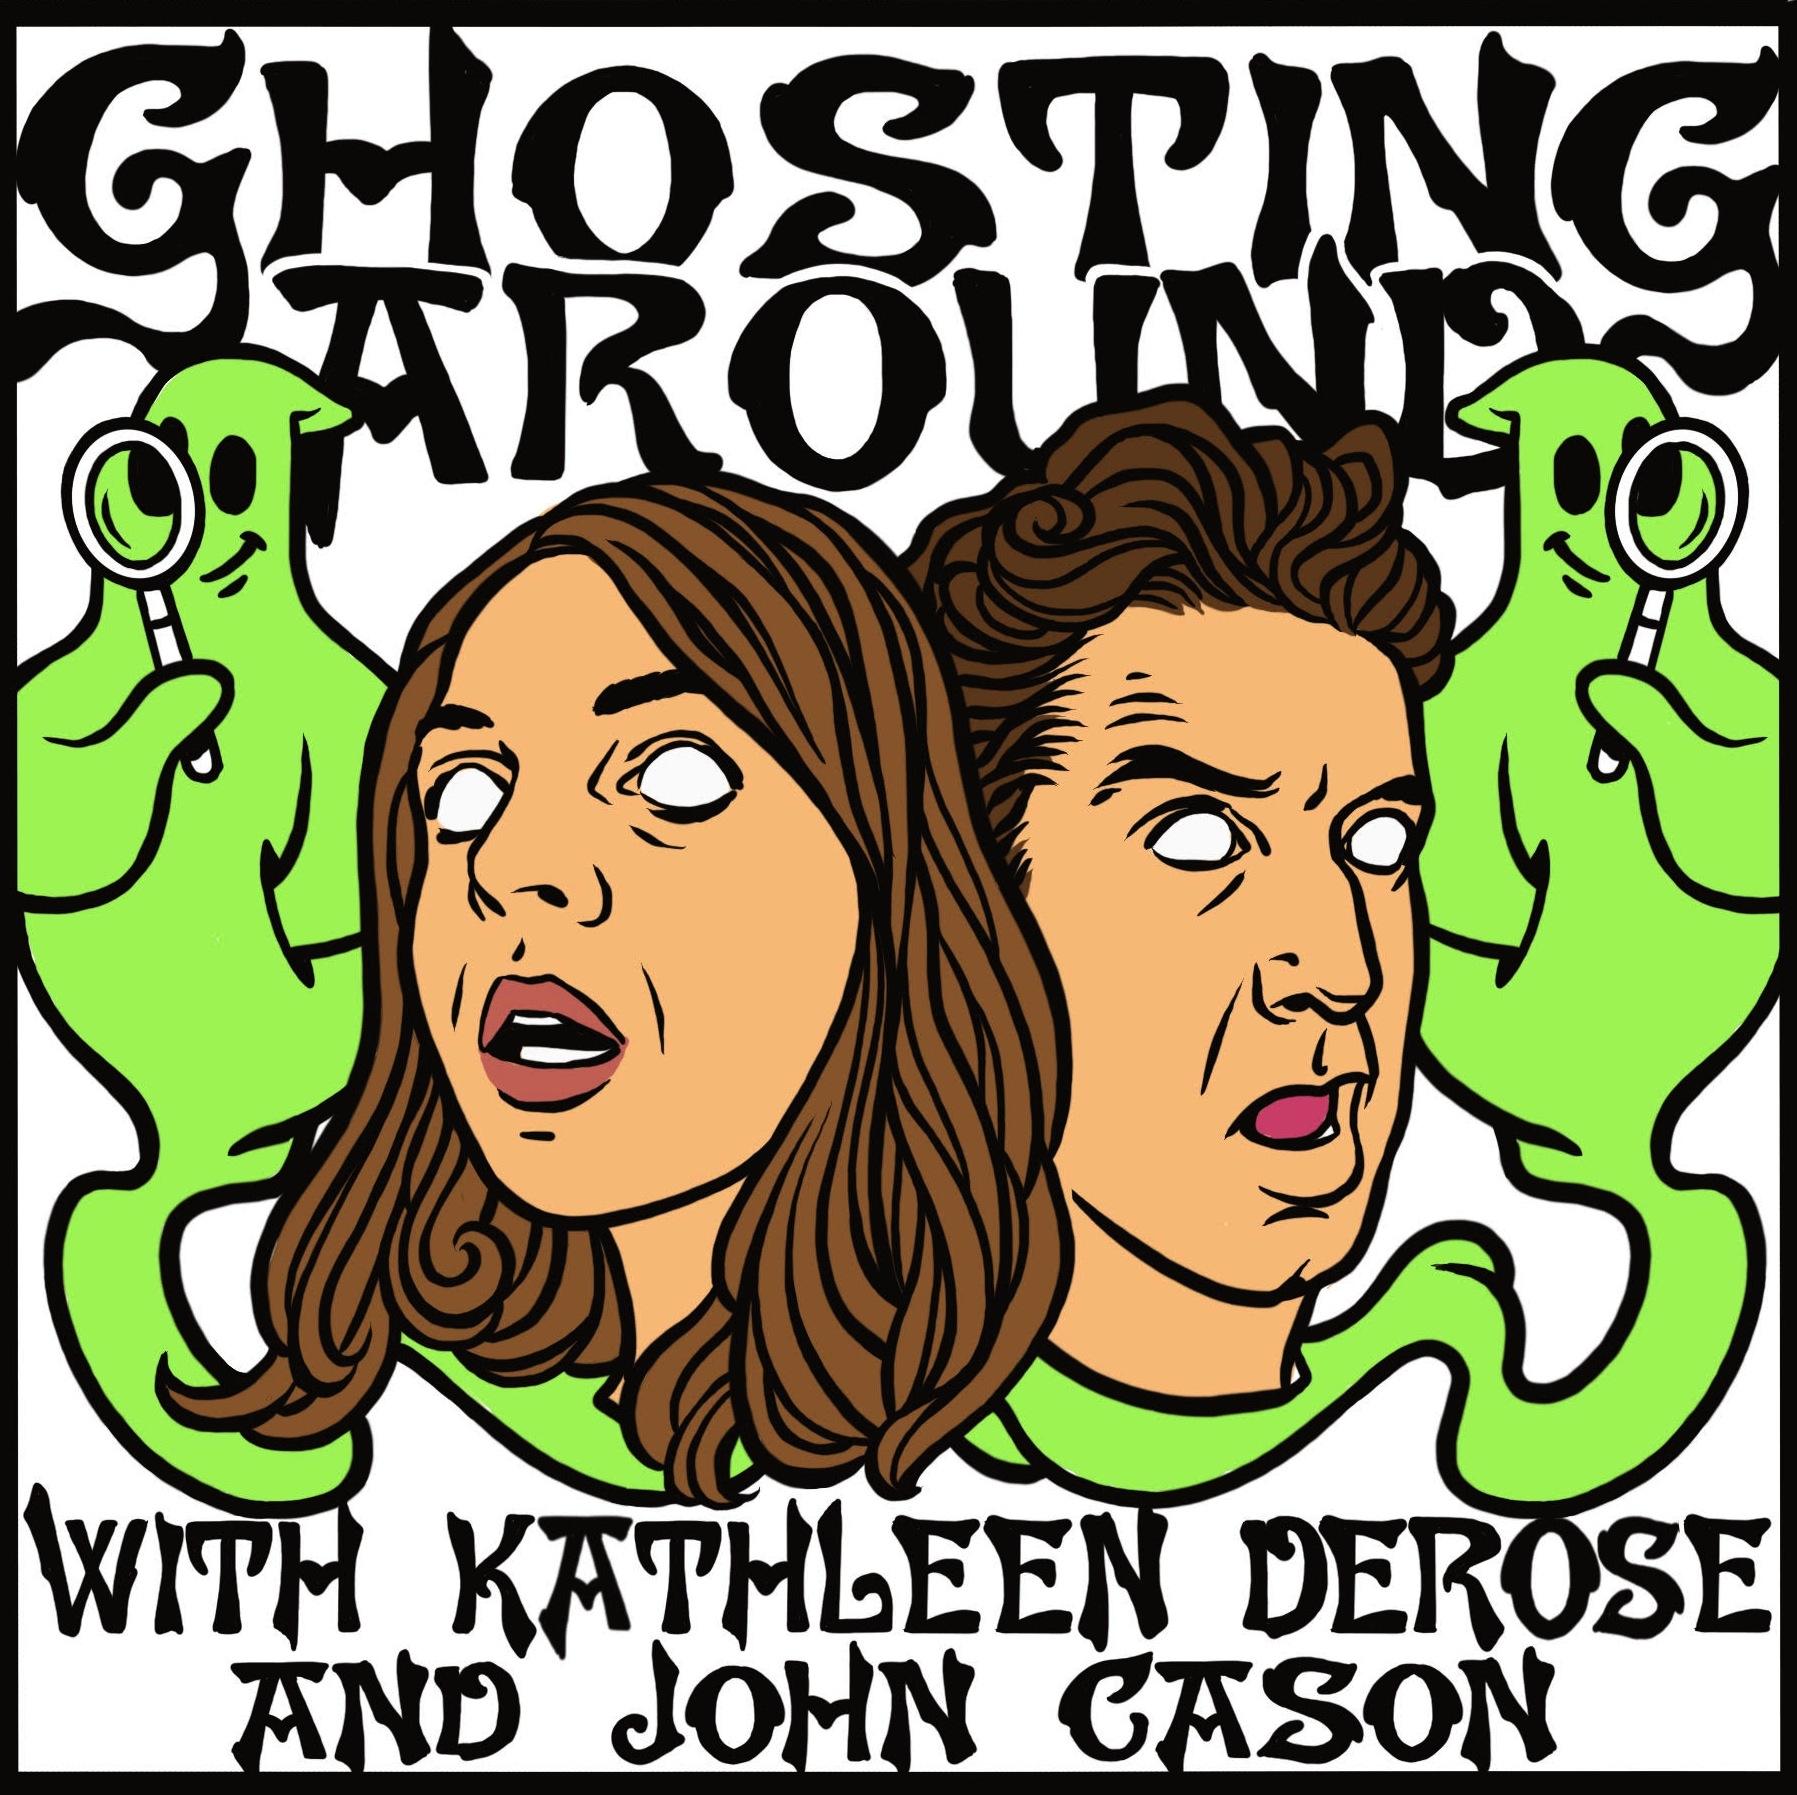 Ghosting Around with Kathleen DeRose and John Cason show art